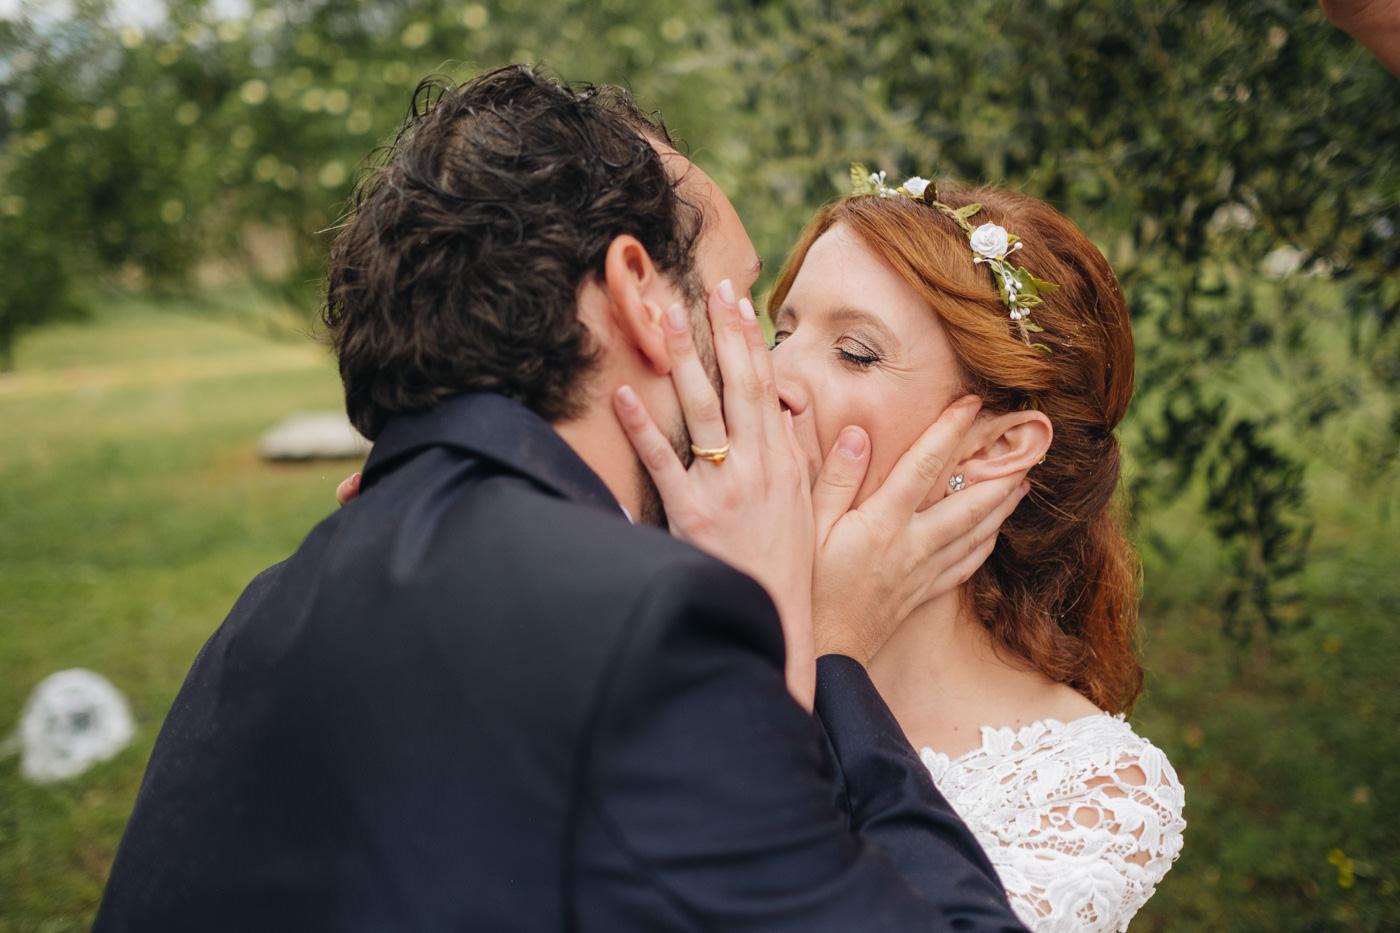 matrimoni_all_italiana_fotografo_matrimonio_toscana-43.jpg